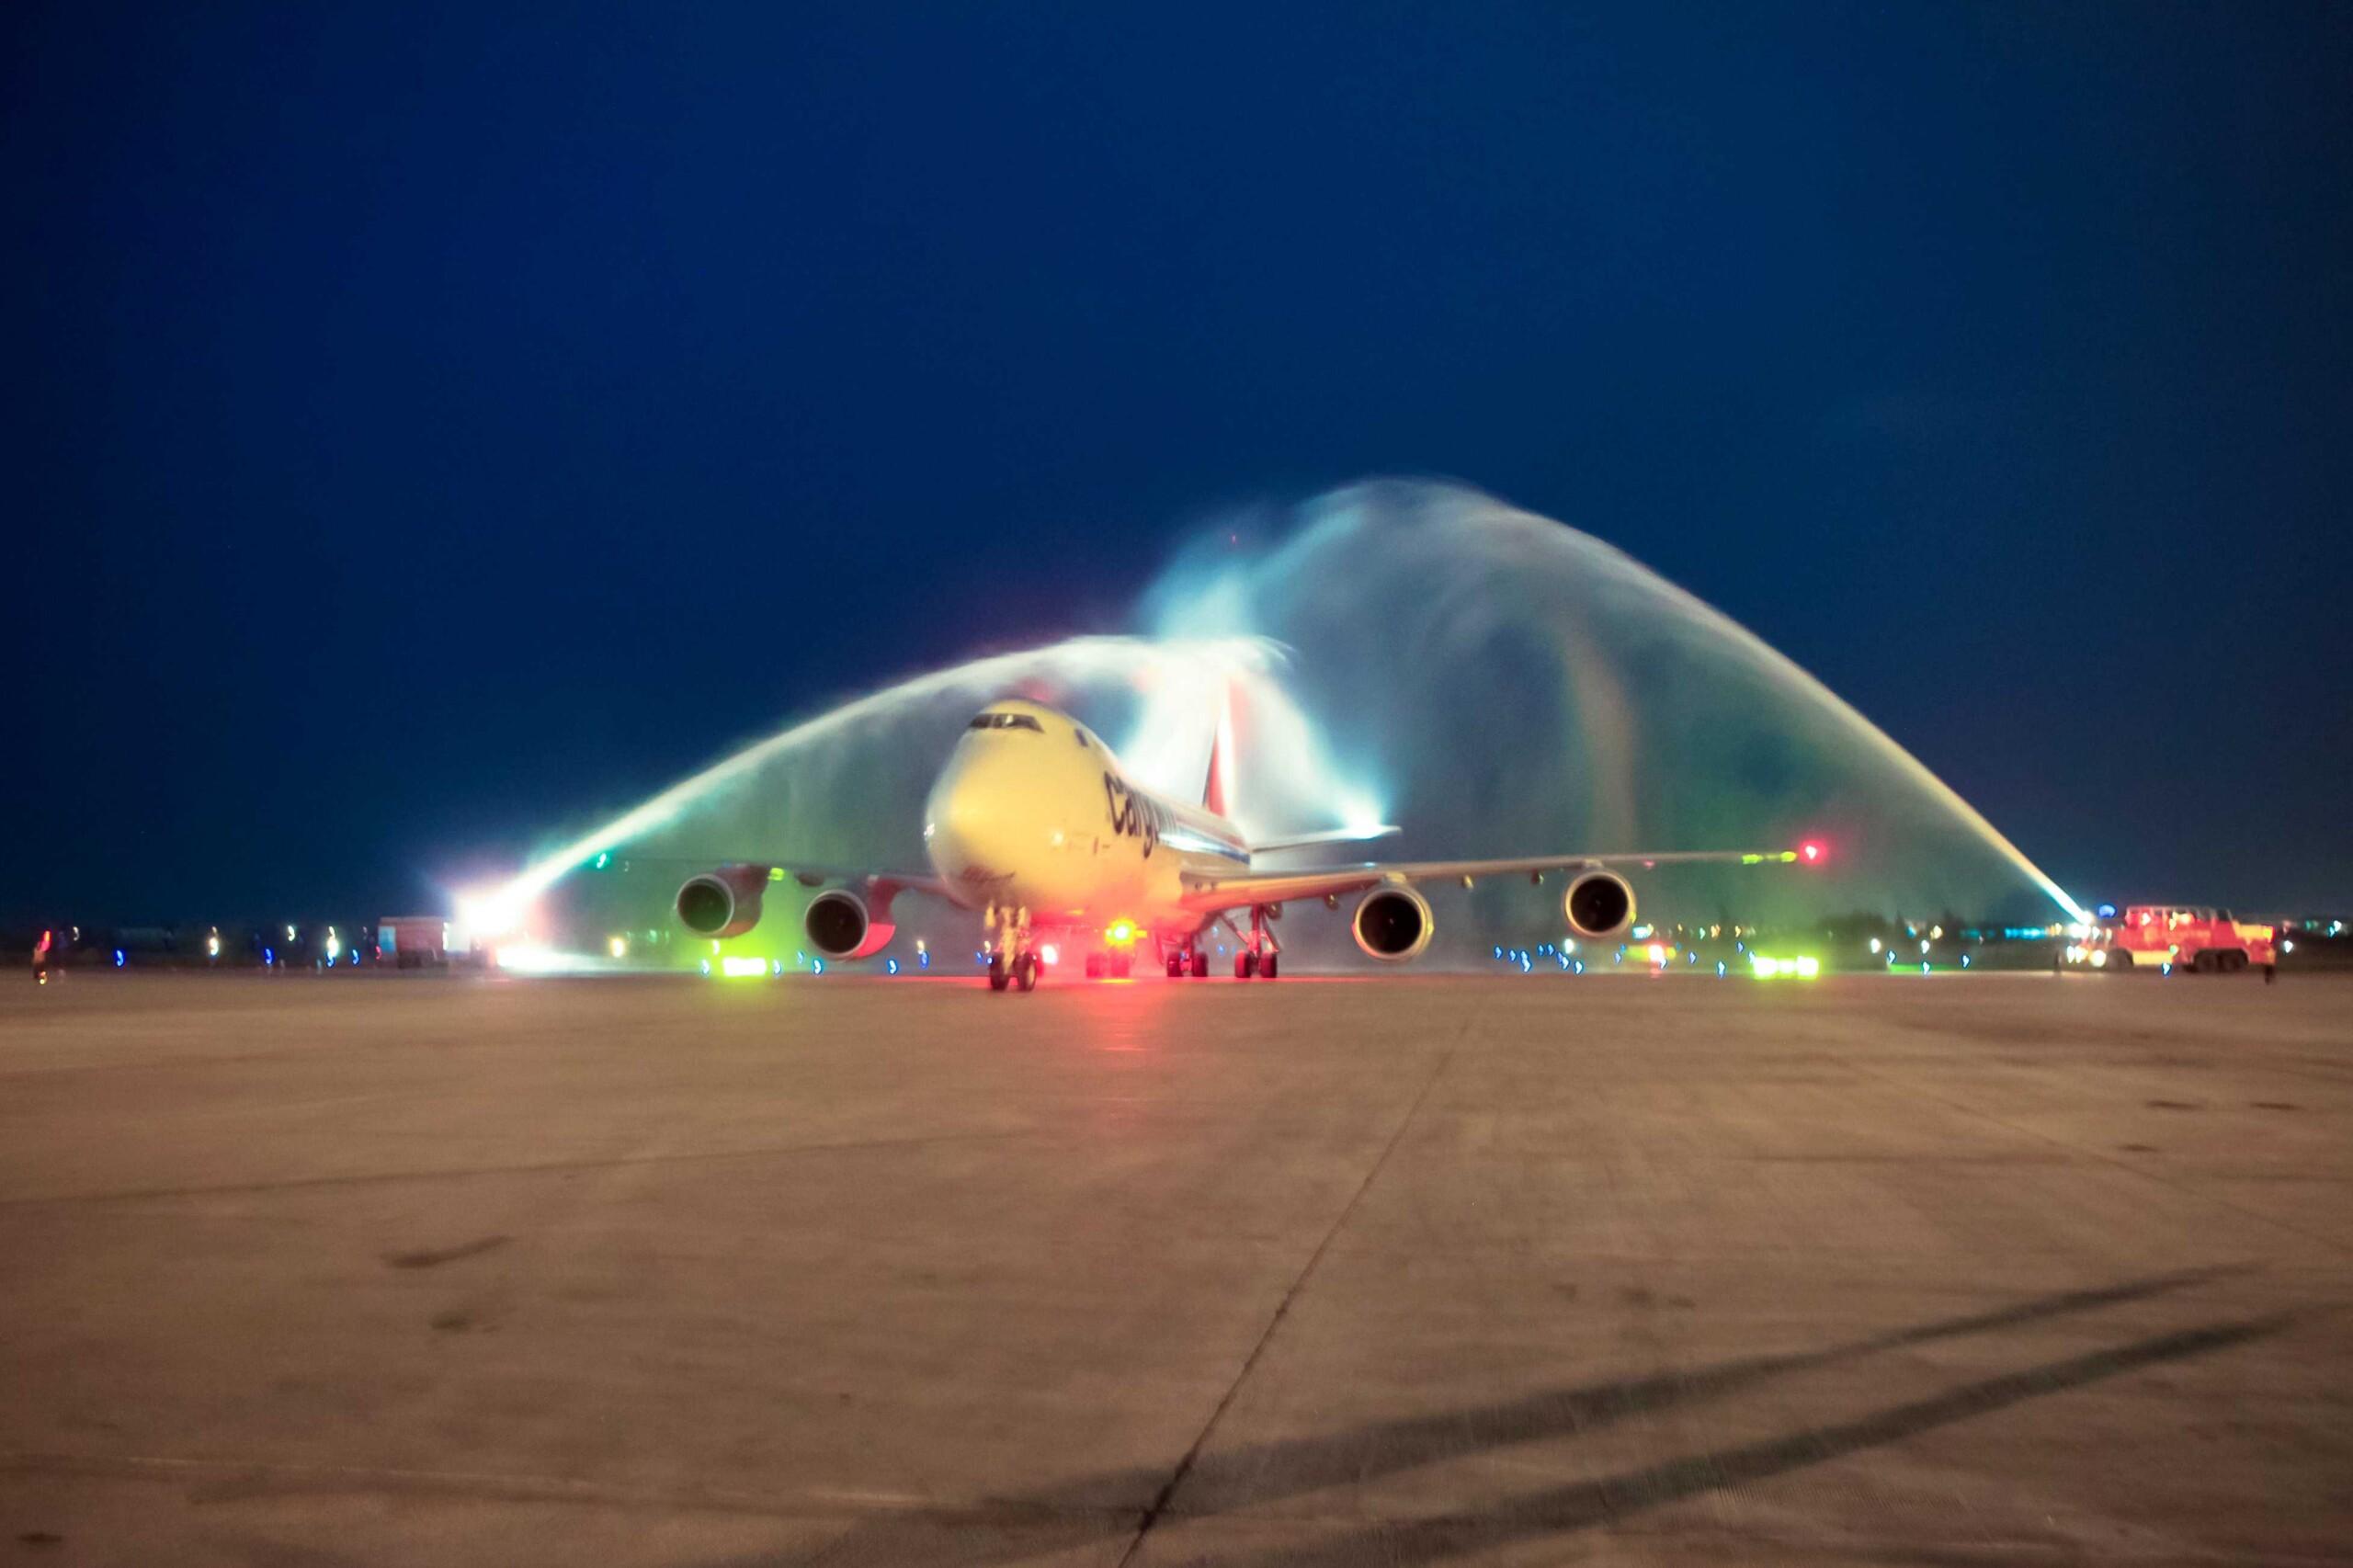 Boeing 747 Queen of the Skies